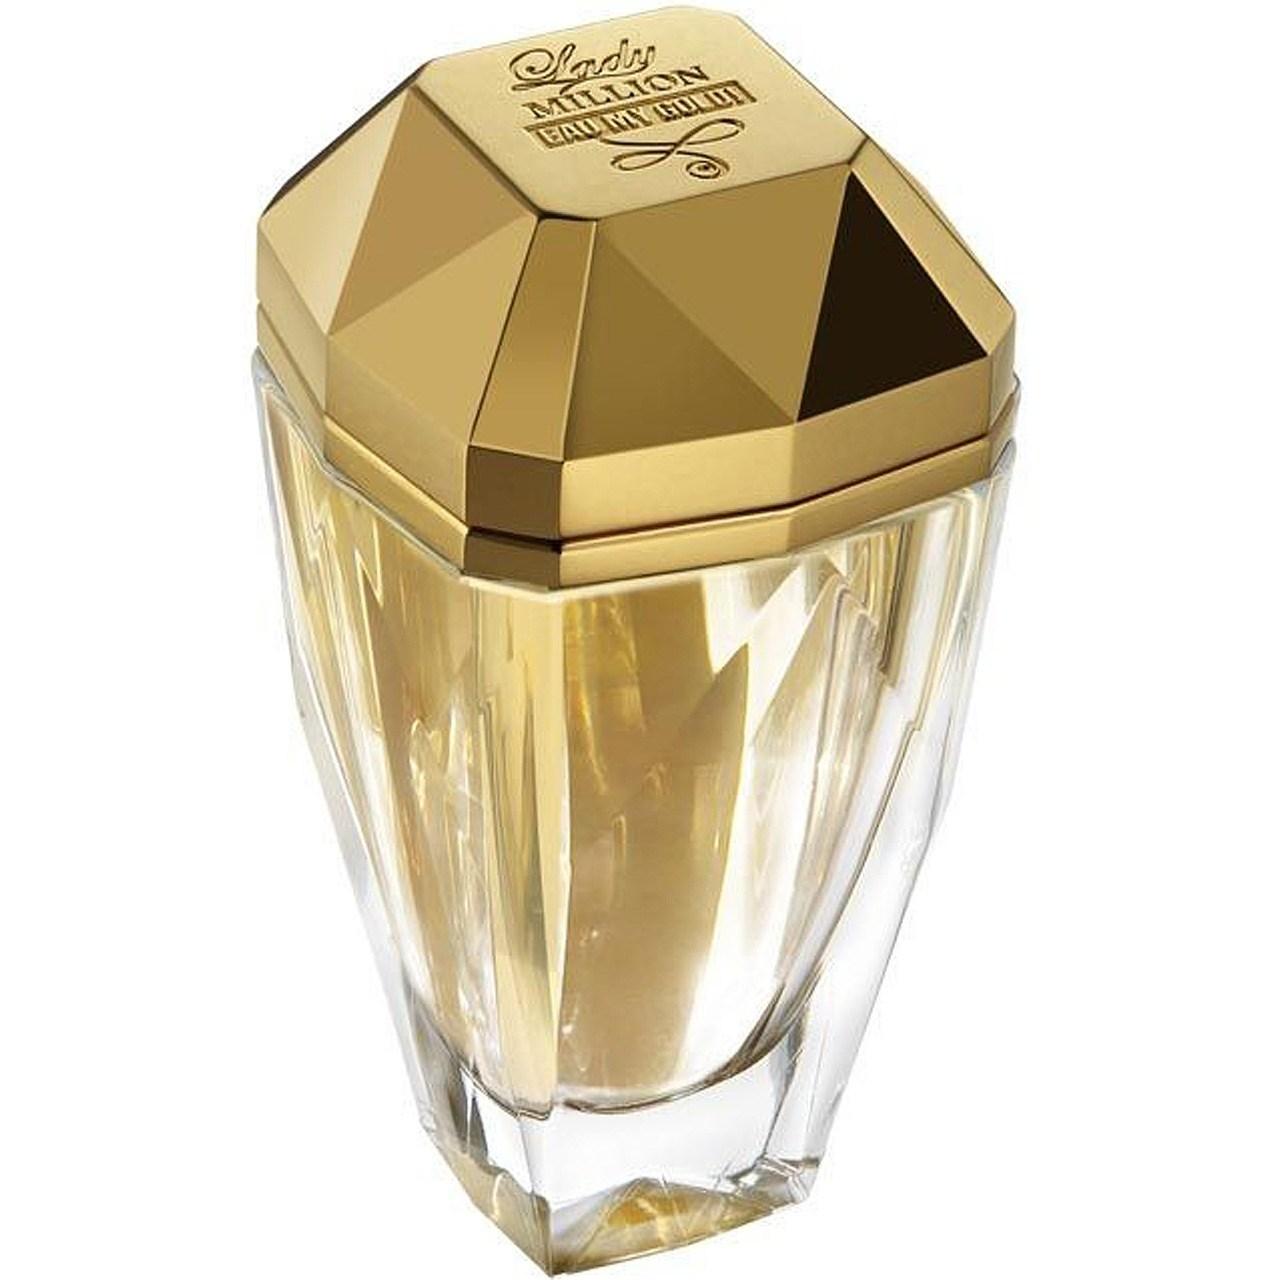 ادو تویلت زنانه پاکو رابان مدل Lady Million Eau My Gold حجم 80 میلی لیتر